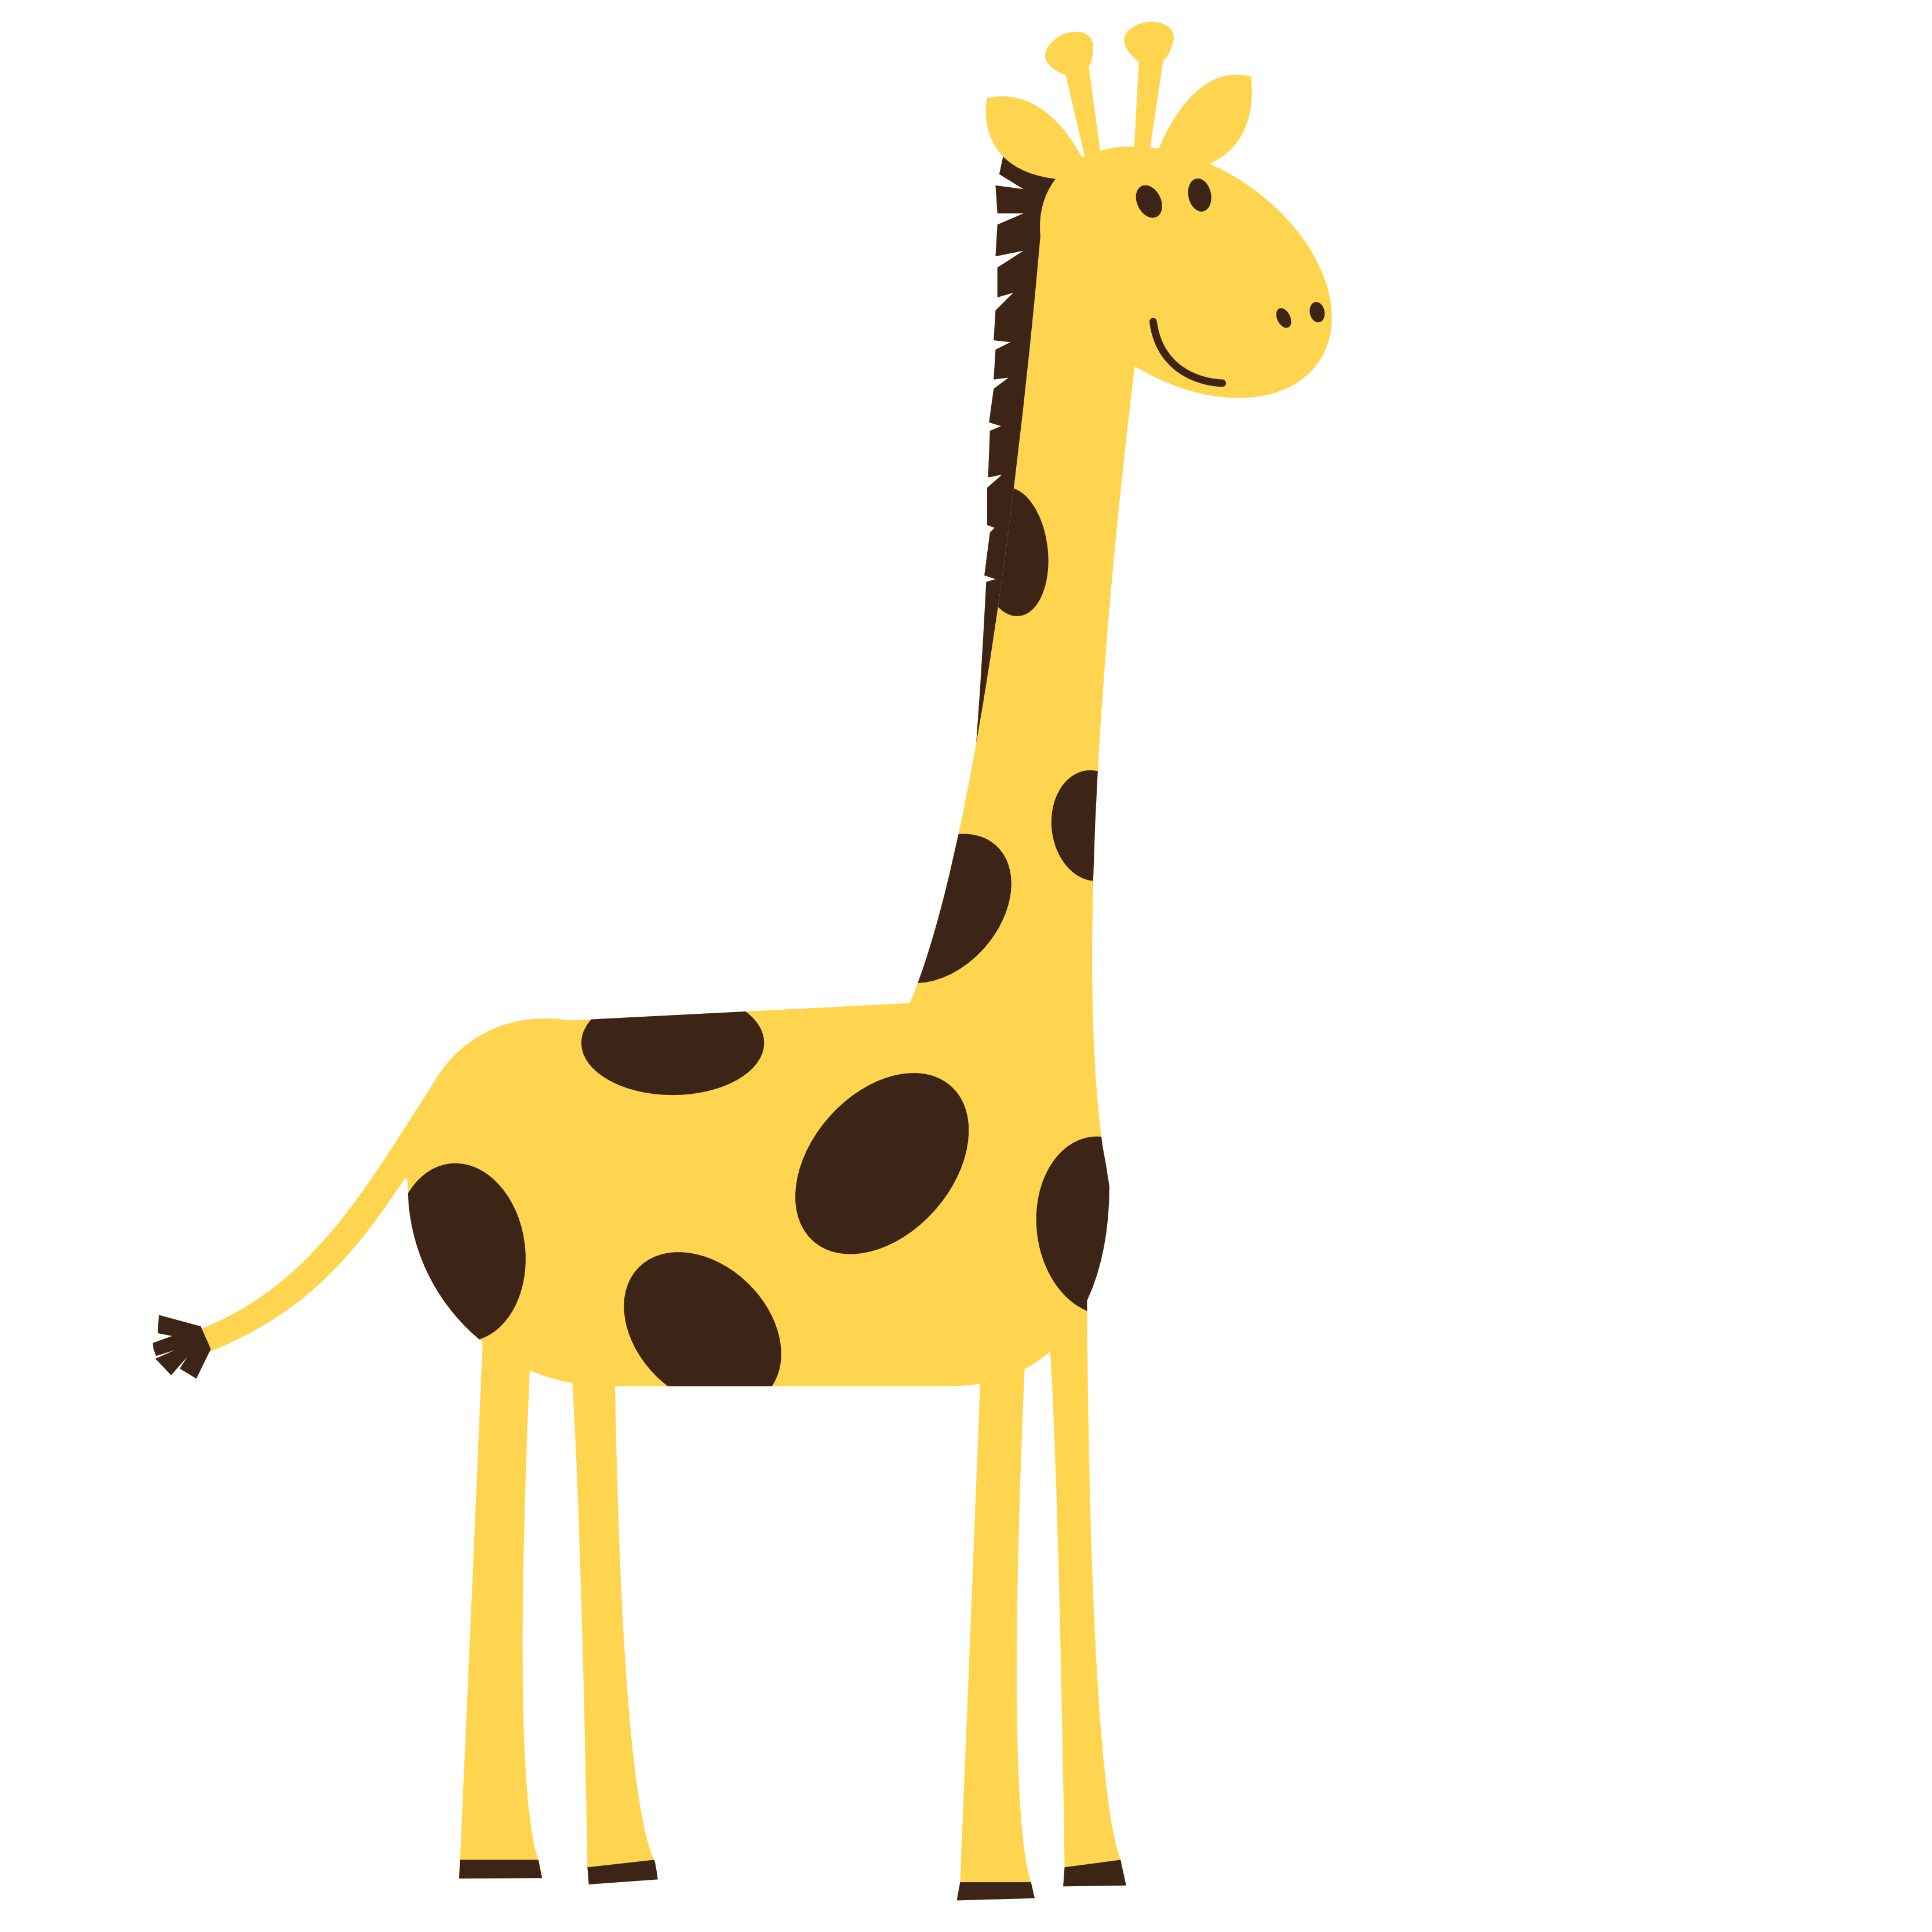 Giraffe clipart #3, Download drawings